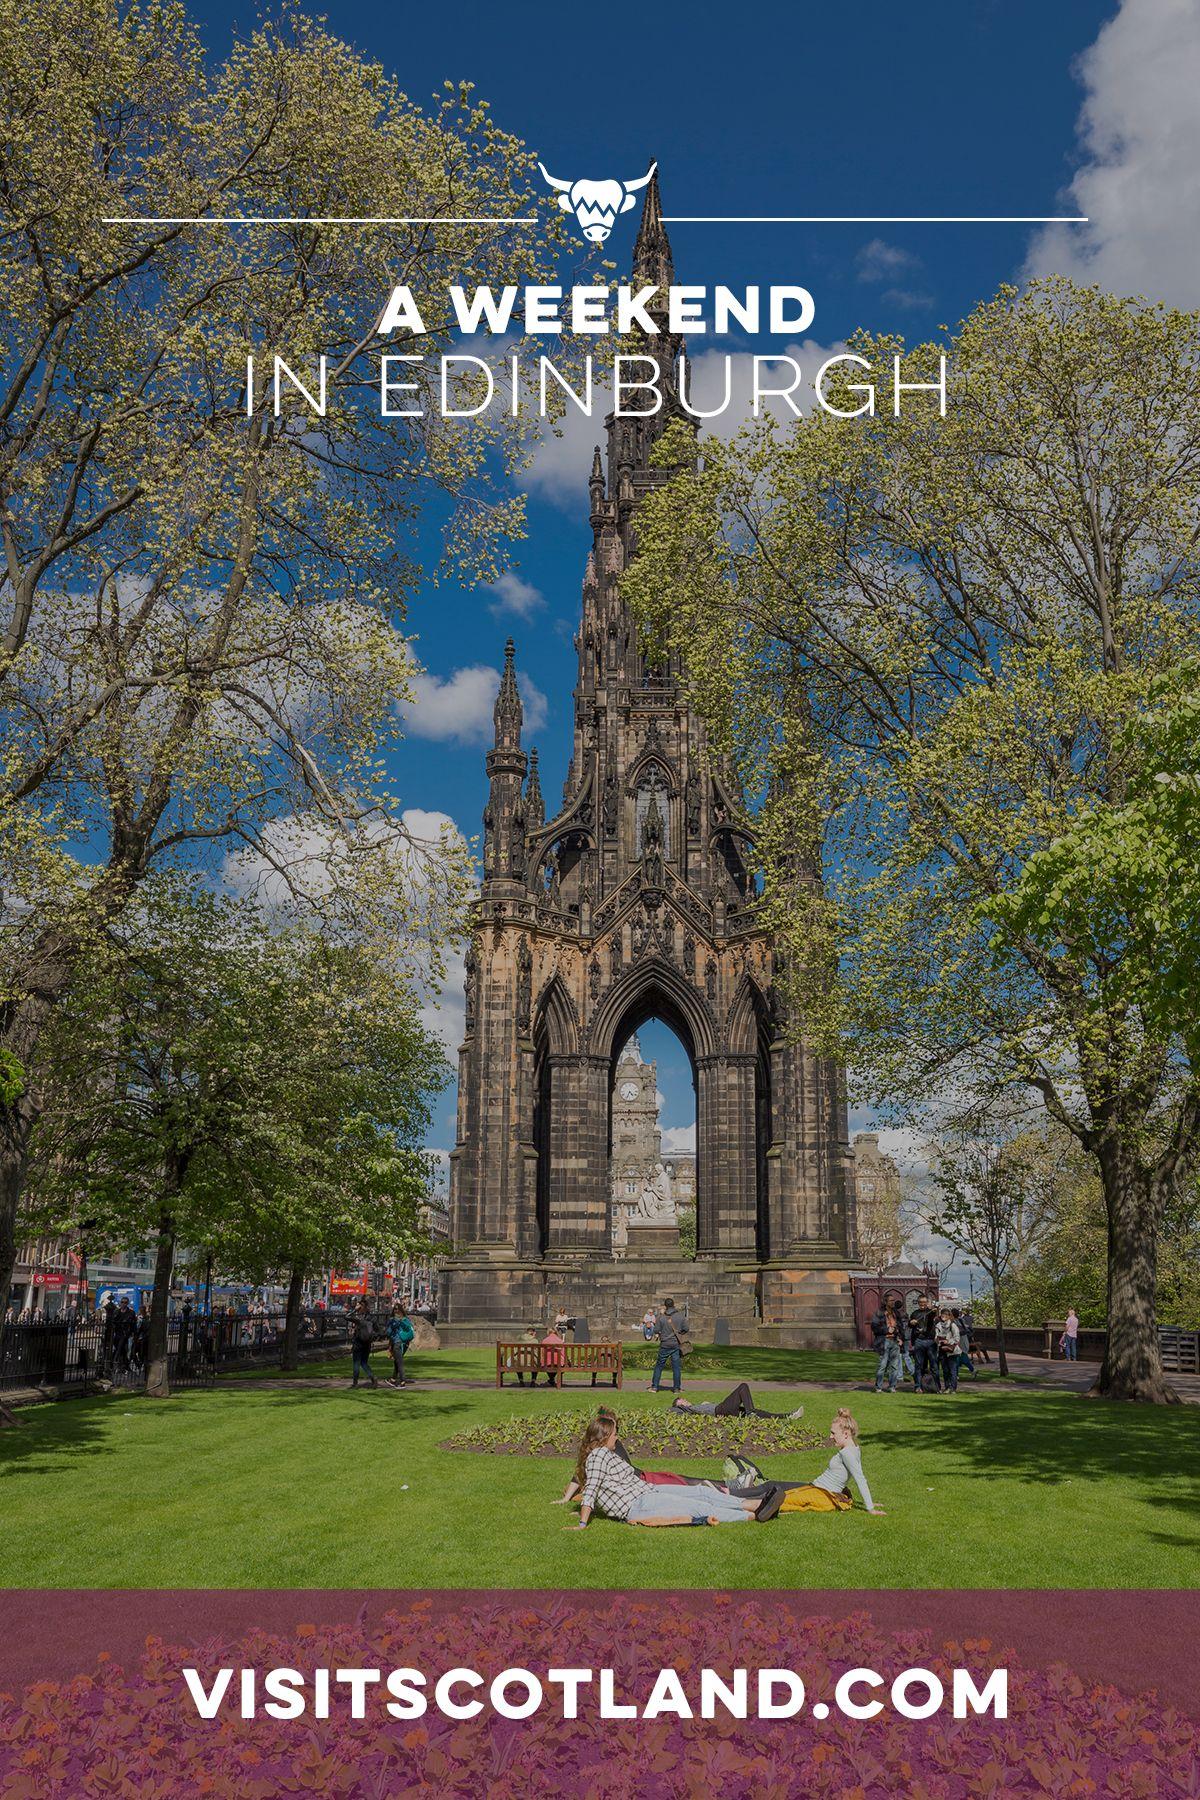 #VisitScotland #ThisisEdinburgh #ScotlandisNow #OnlyinScotland